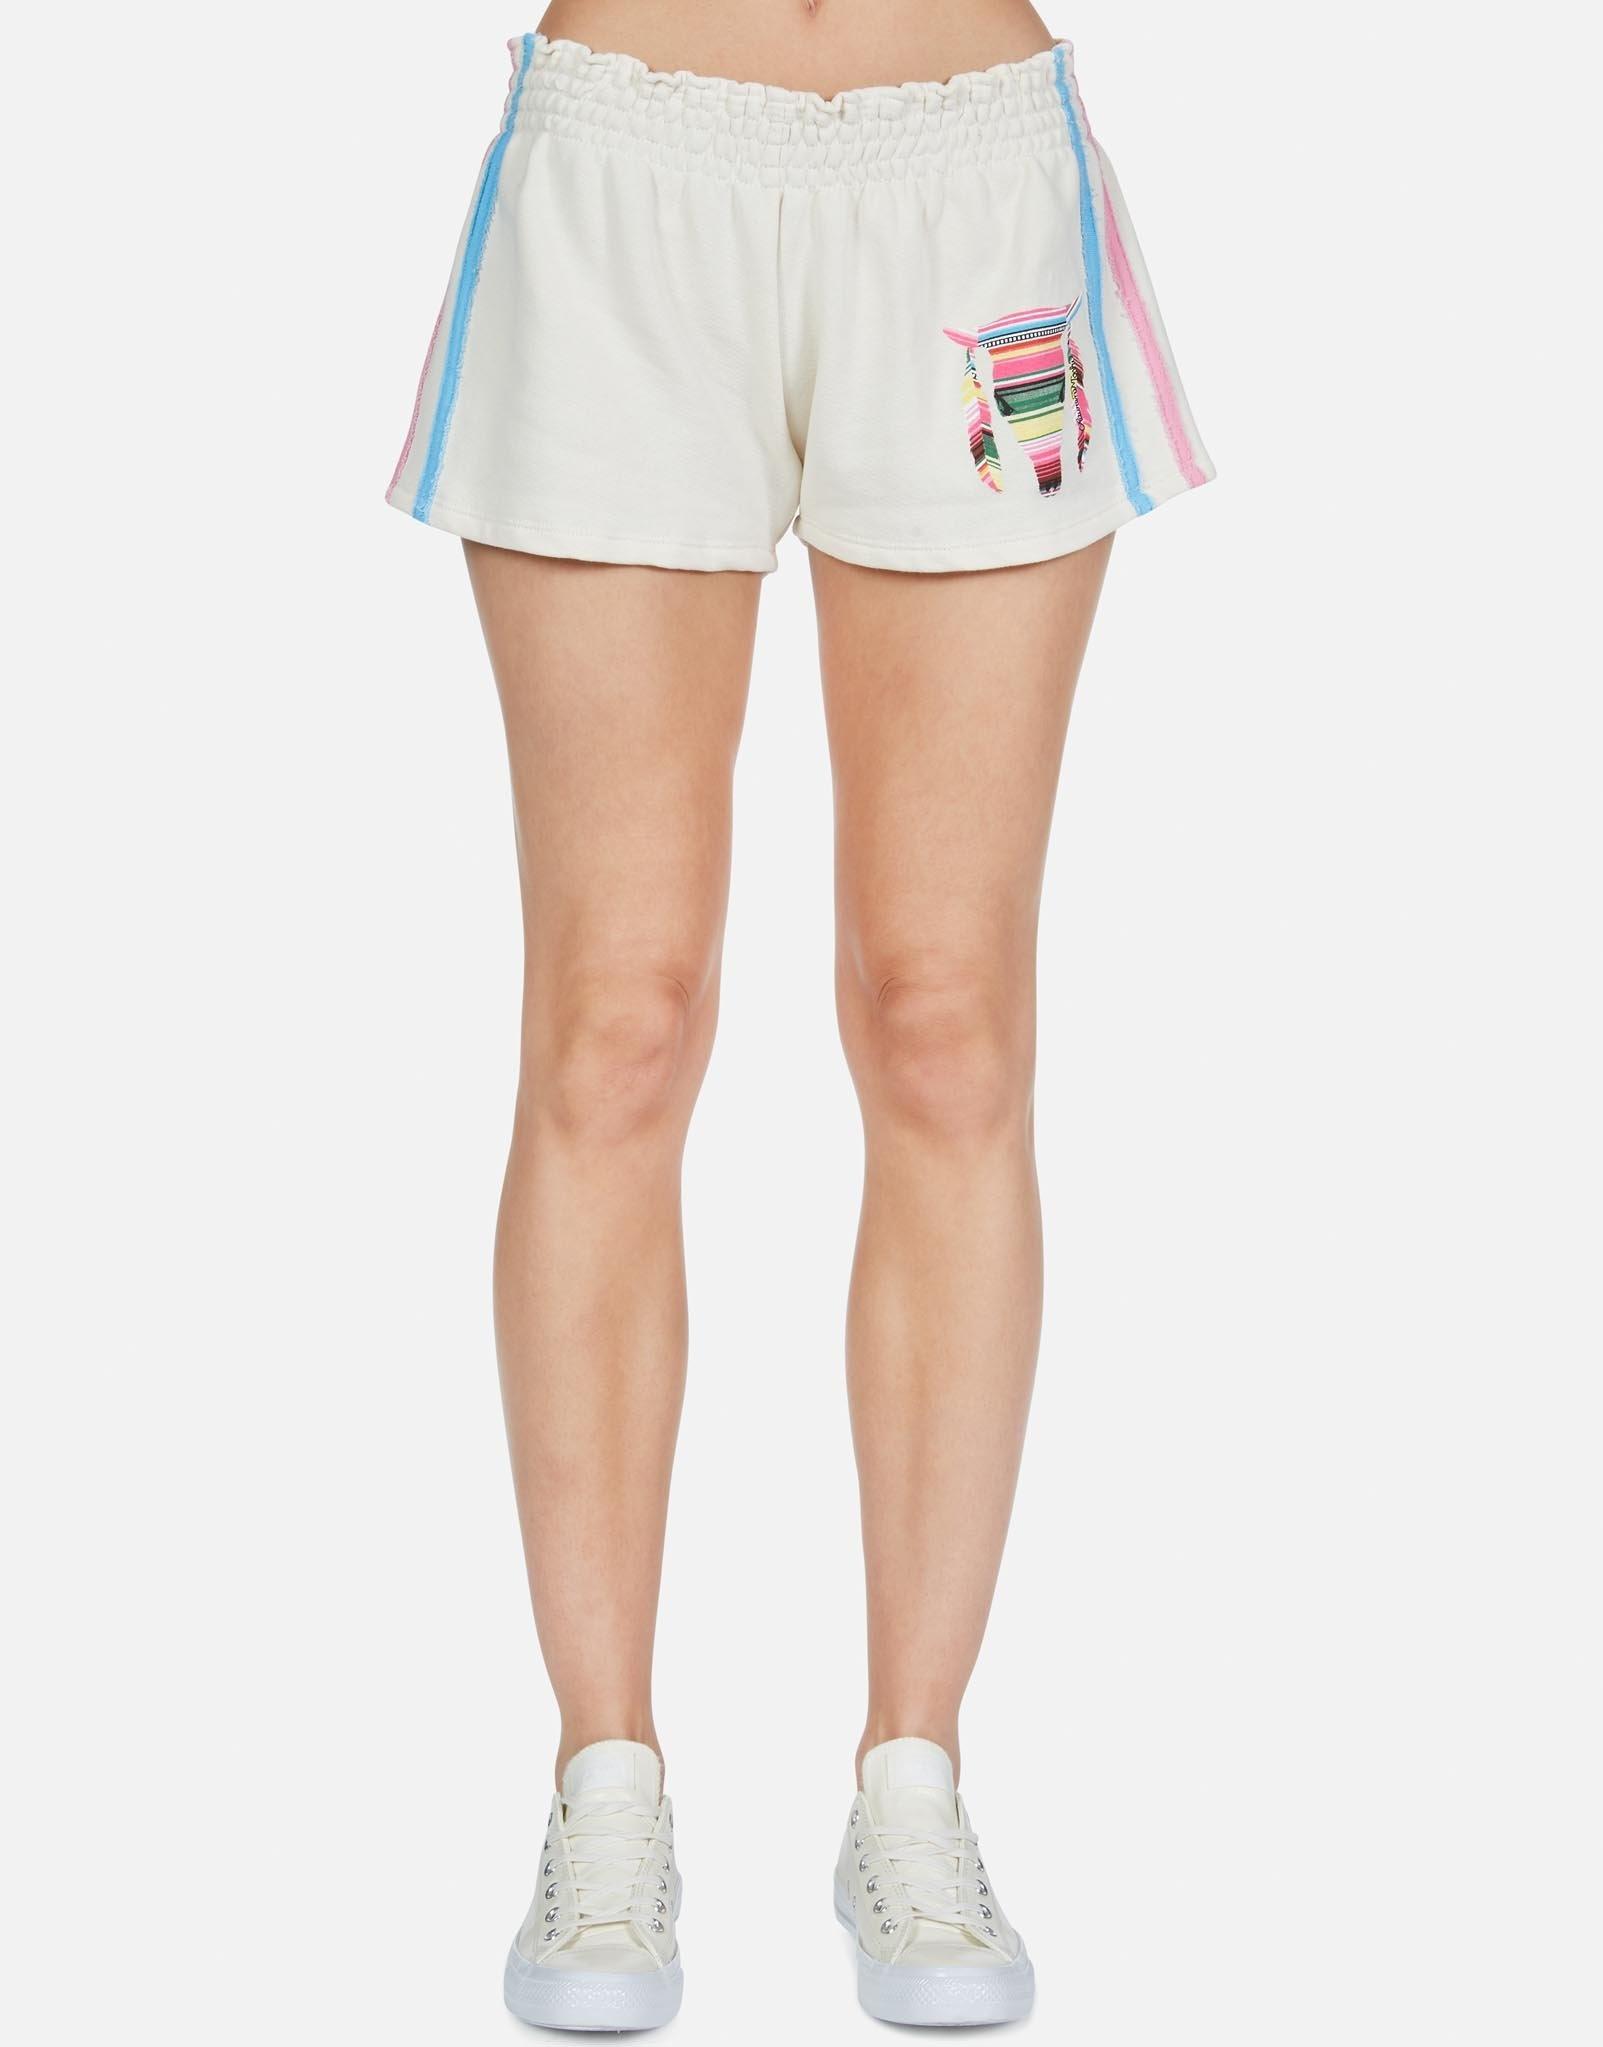 Lauren Moshi Shandra Smocked Shorts w/ Stripe Bull S